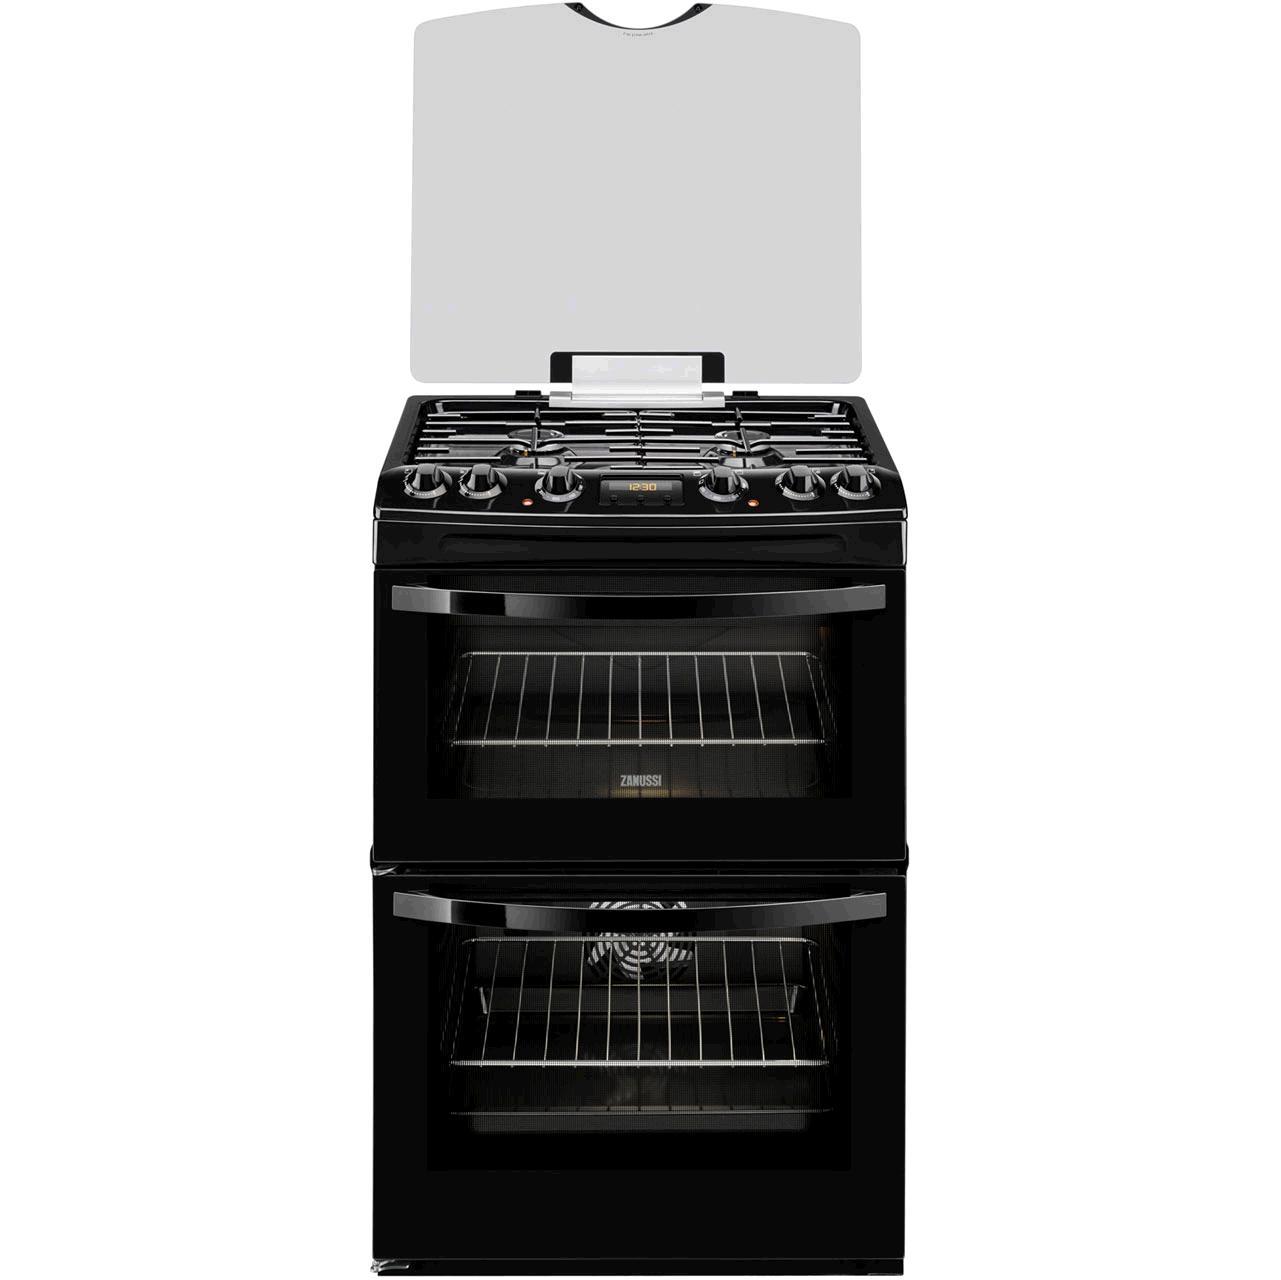 ZANUSSI Dual Fuel Black Freestanding cooker ZCK68300B